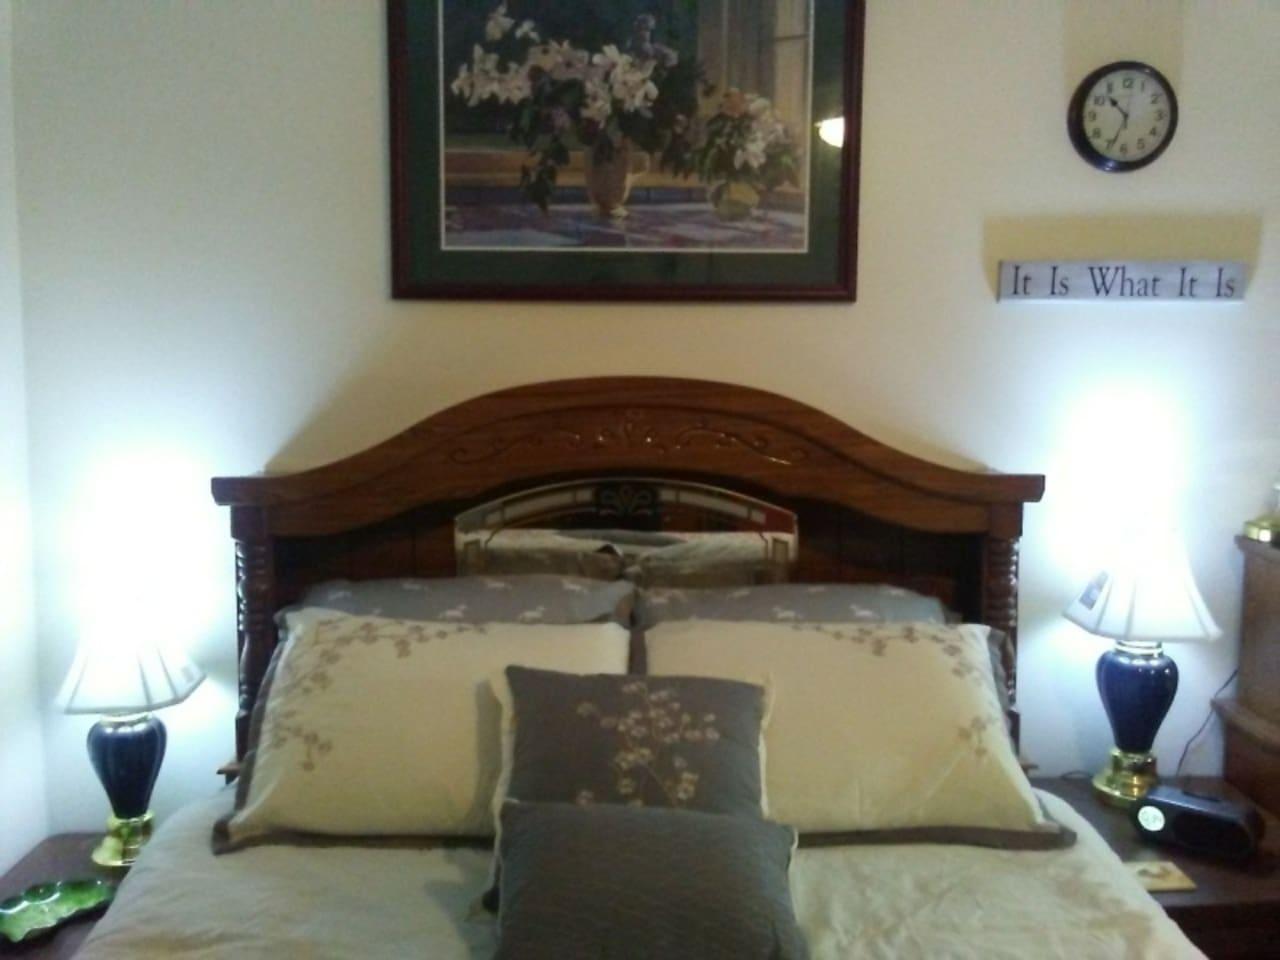 Queen Bed - Night tables - No Headboard Light On